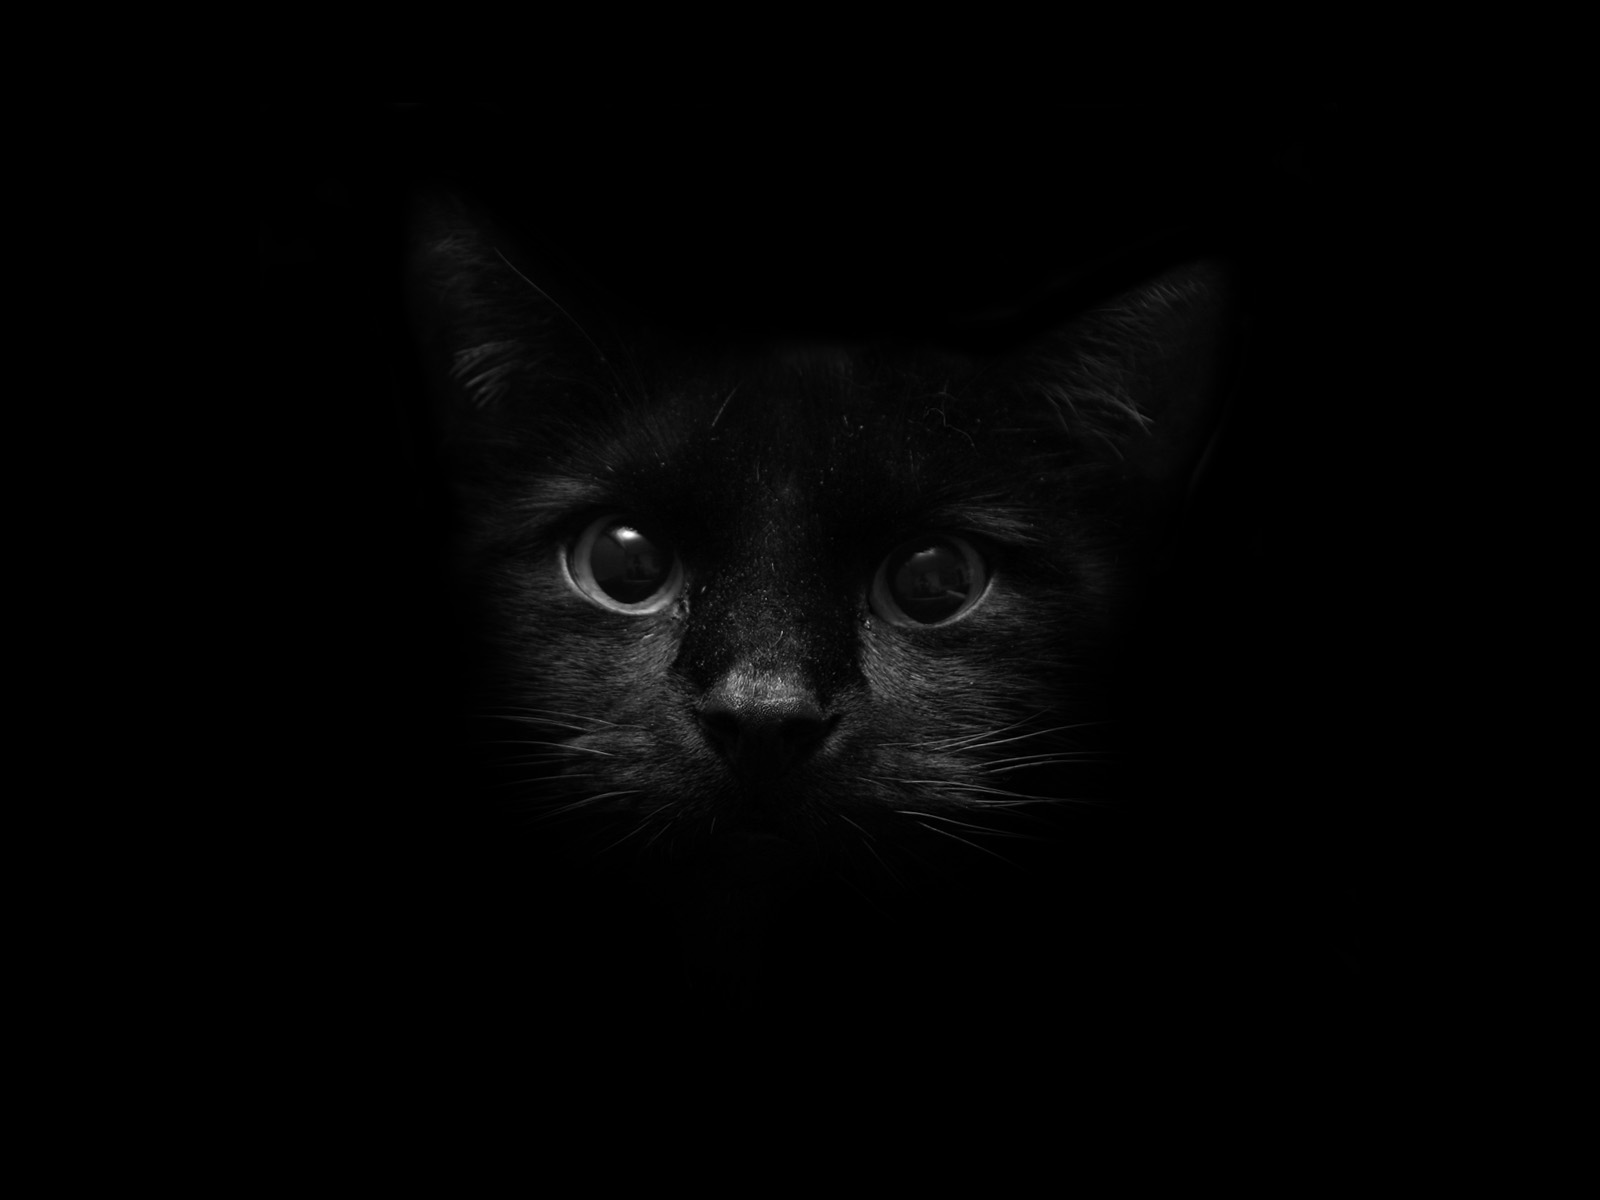 Black Cat Background Tumblr Tumblr Cats Wallpaper ...